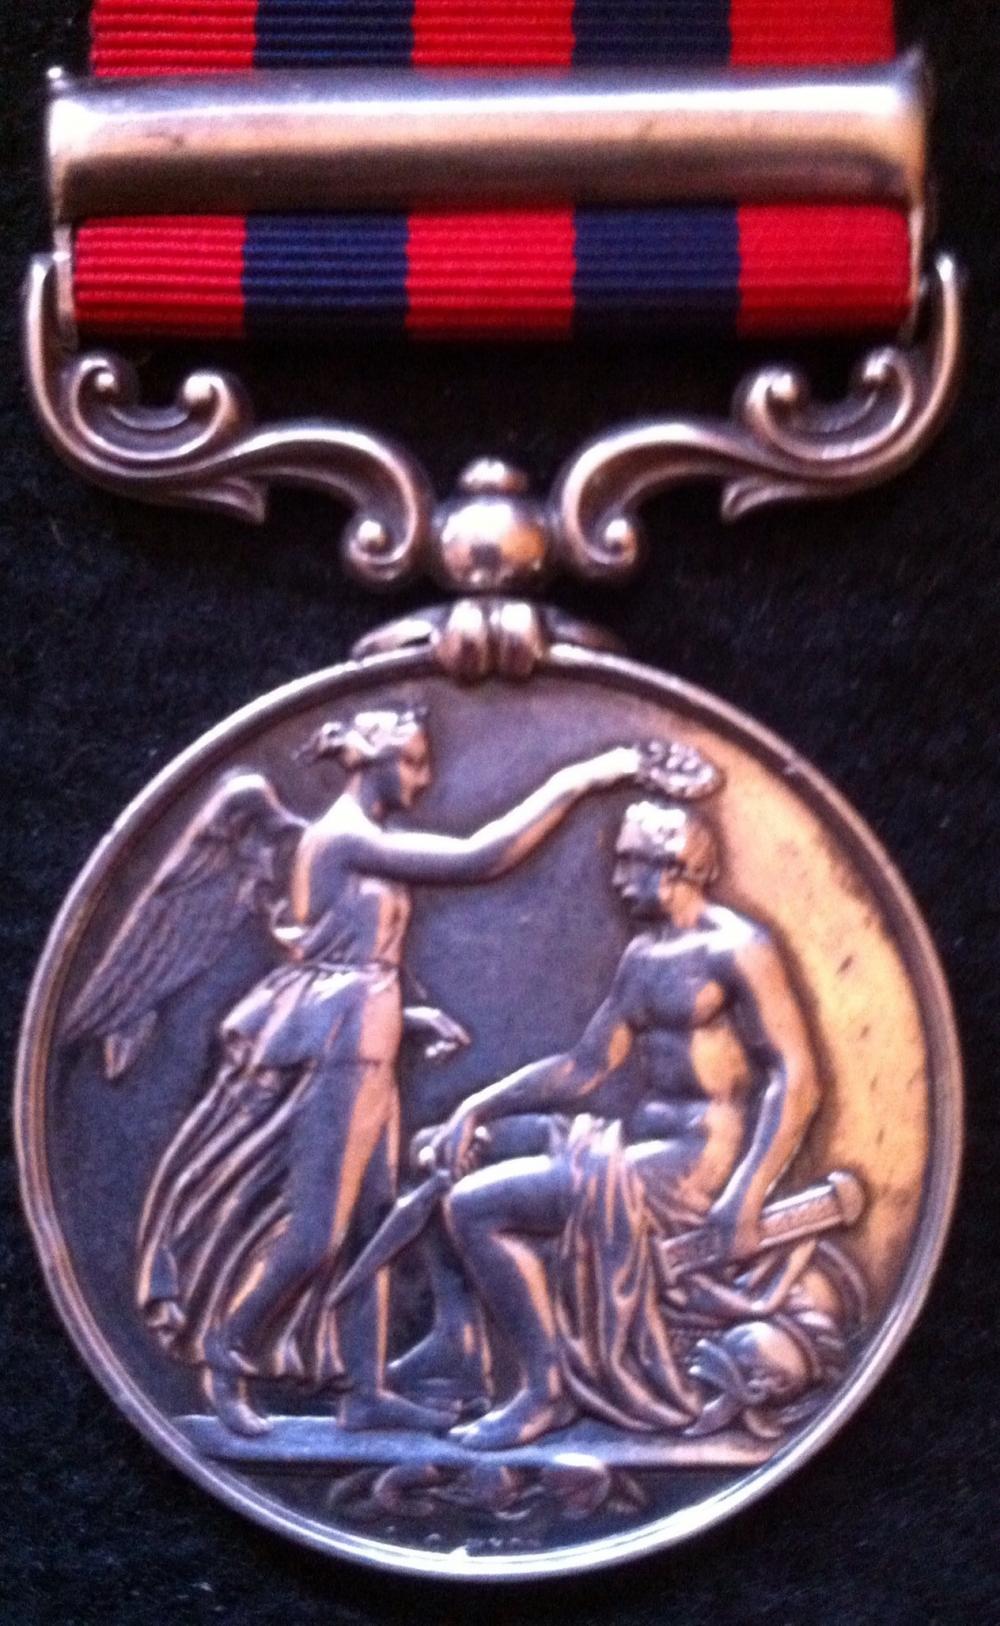 The Indian General Service Medal of Colonel Sebastian Moran